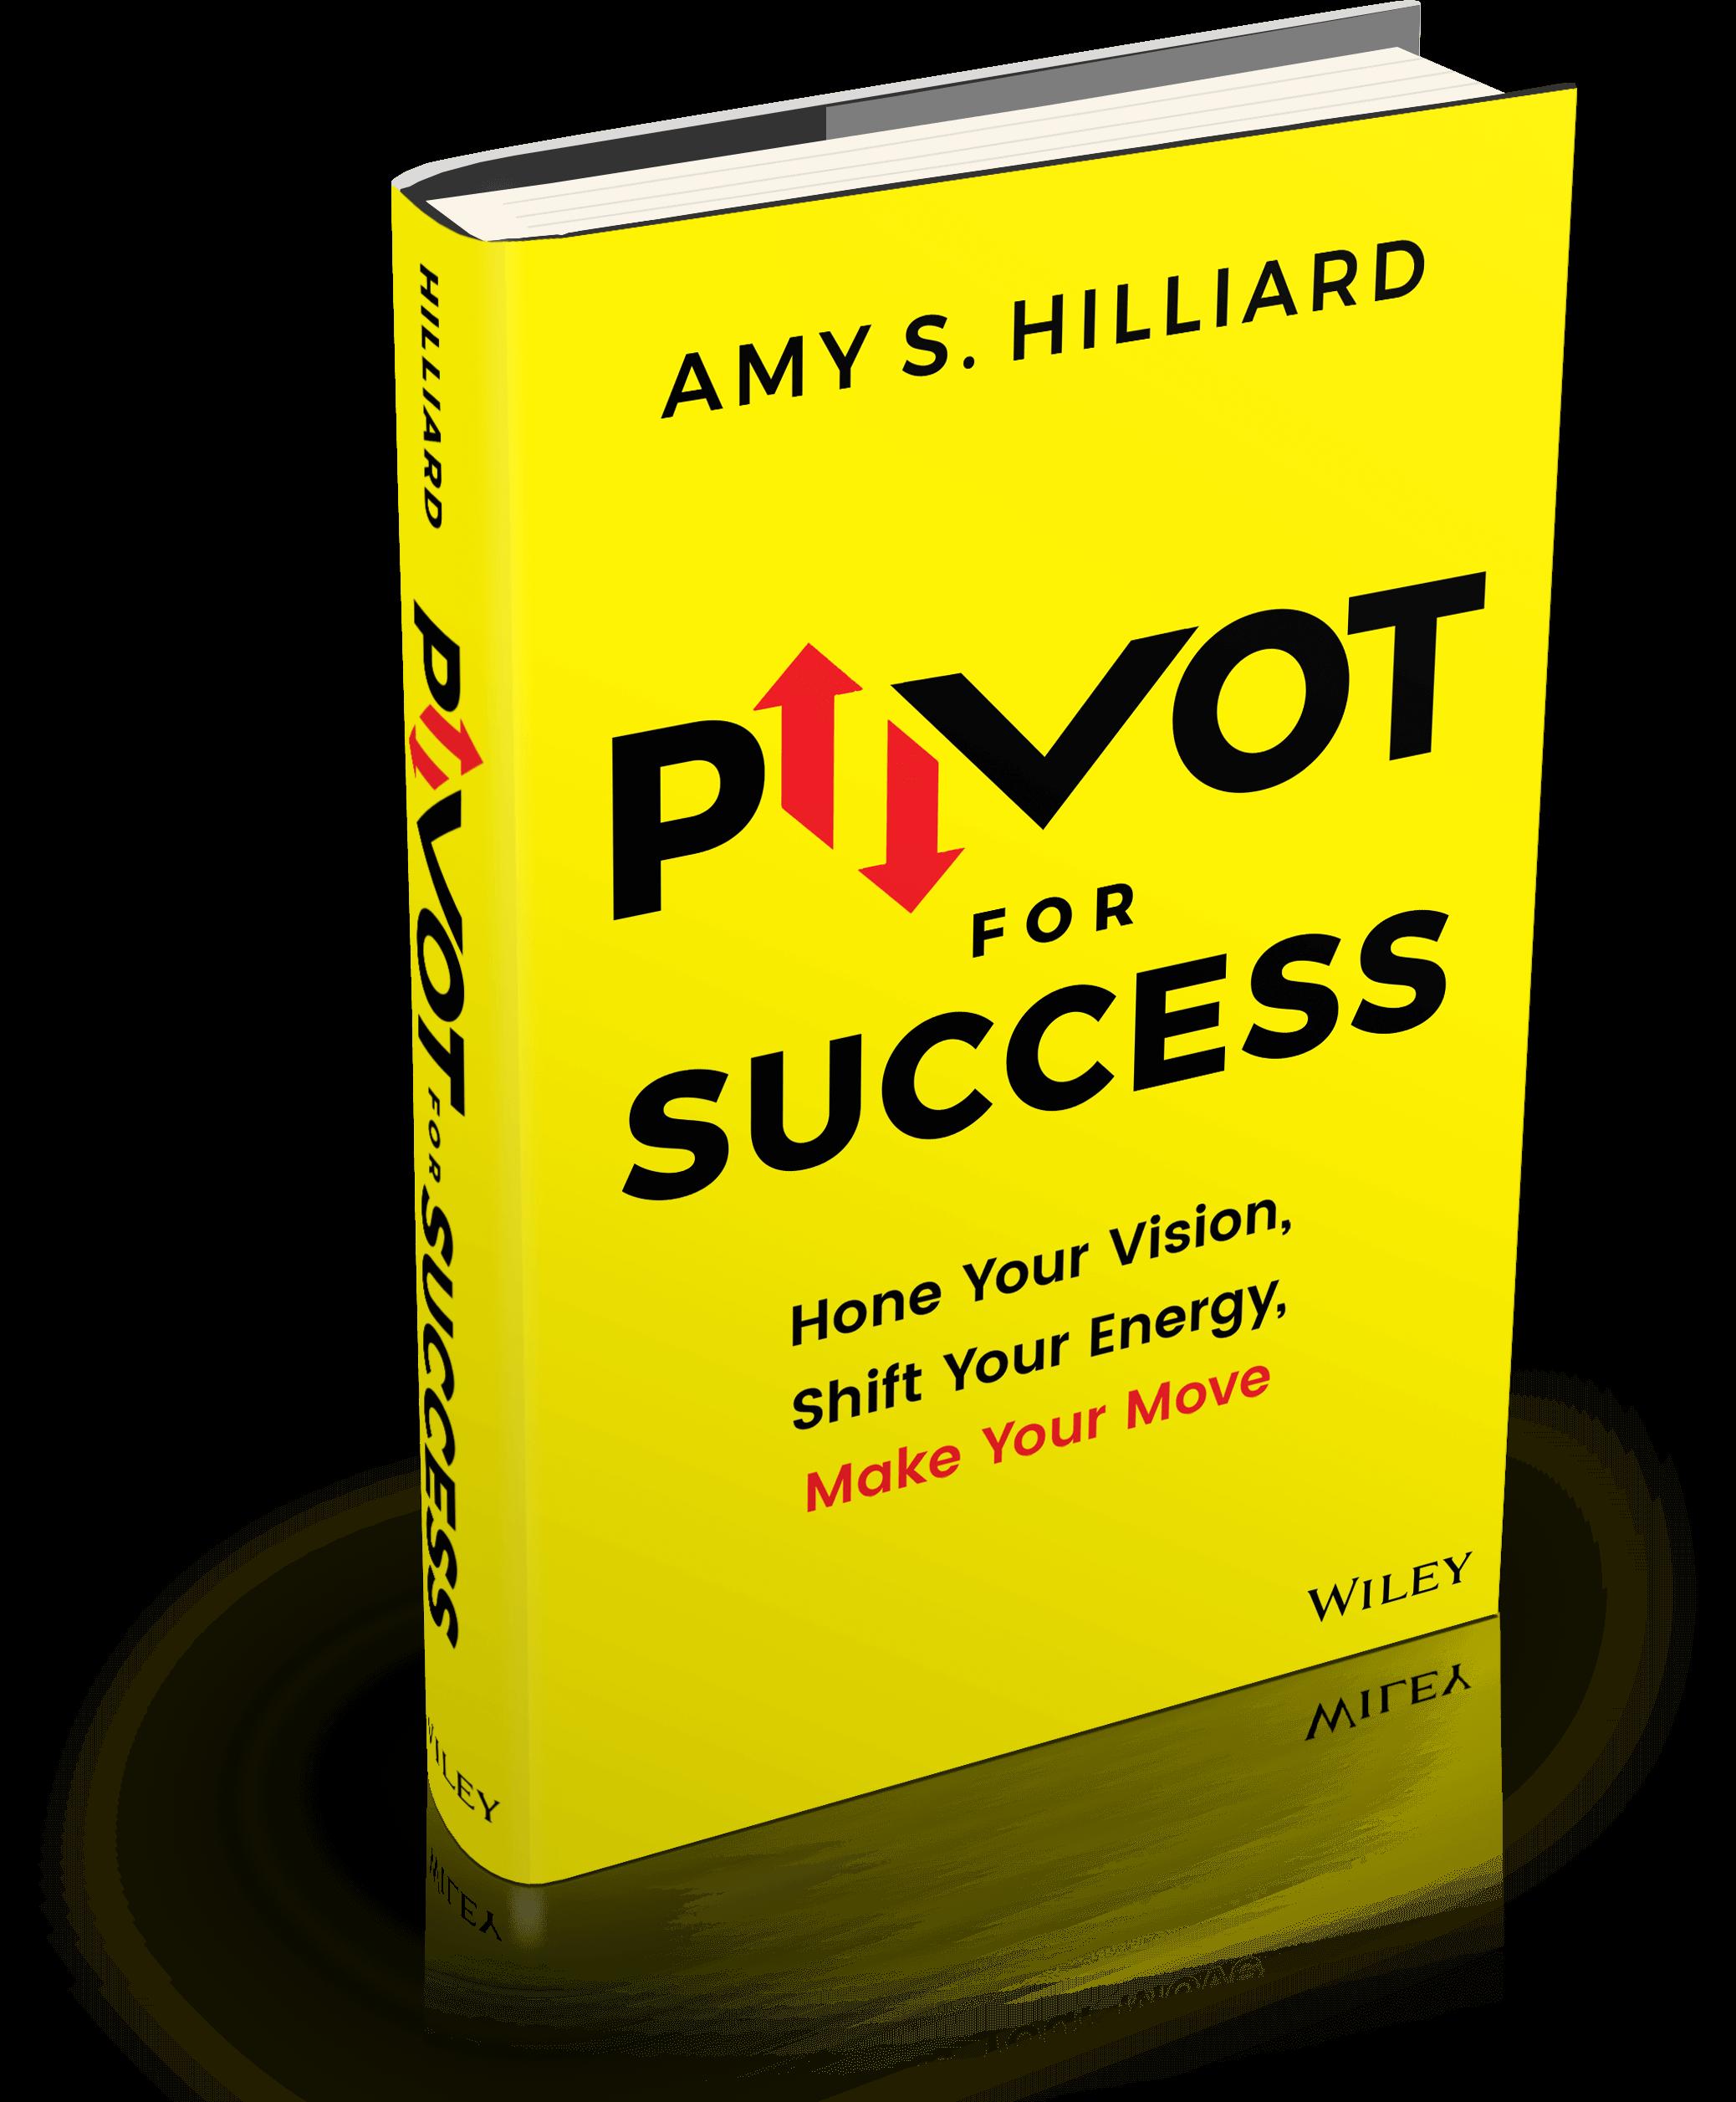 Hilliard_3D_Pivot for Success - book (1)